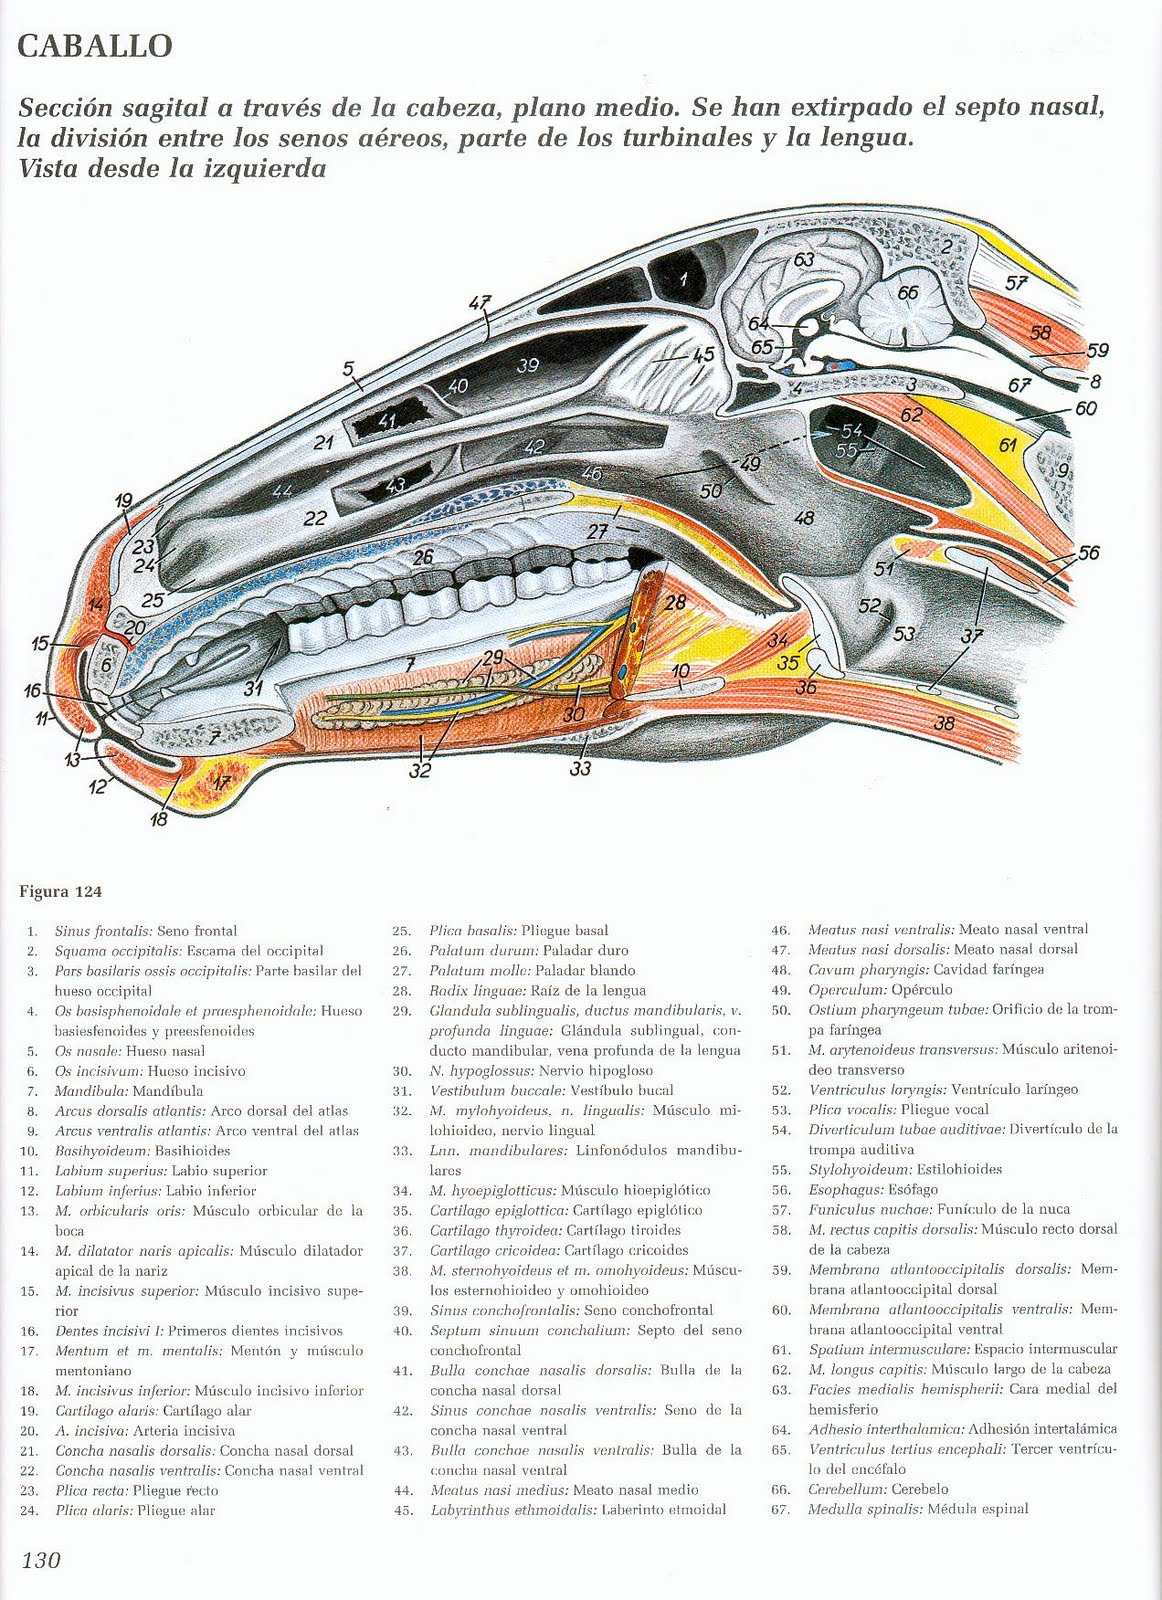 Anatomia veterinaria: material 2011 - Sistema respiratorio Equino